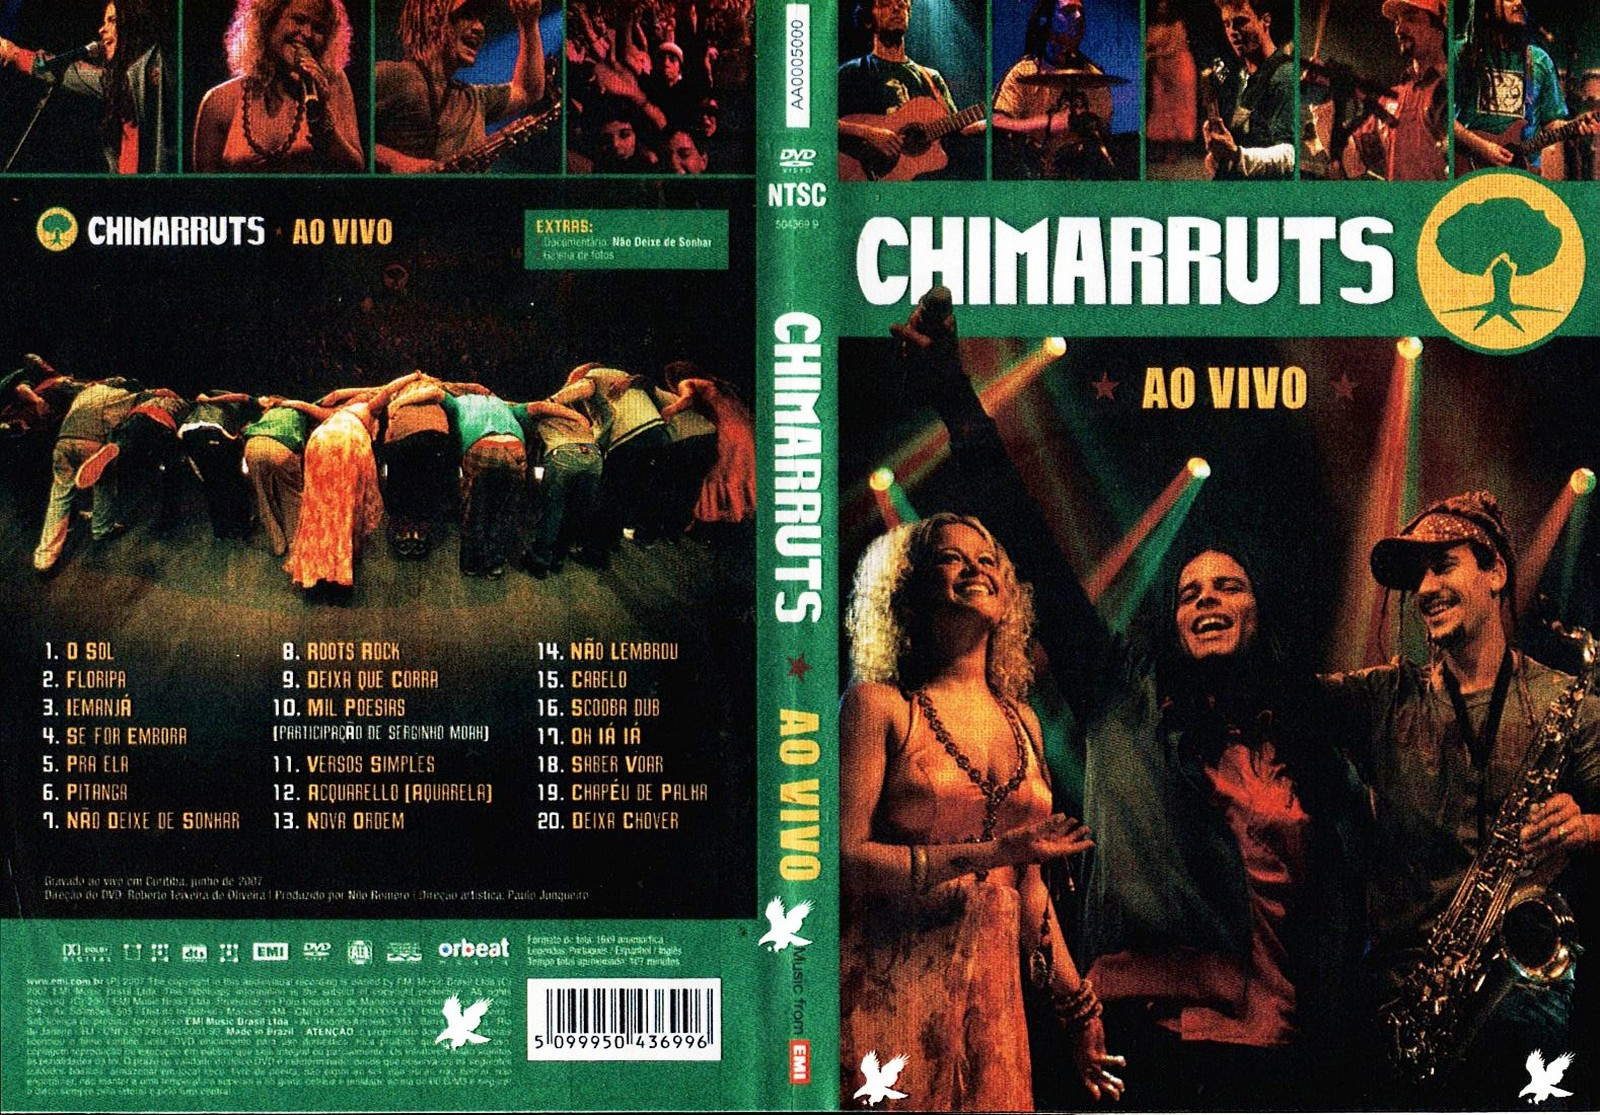 gratis dvd chimarruts ao vivo